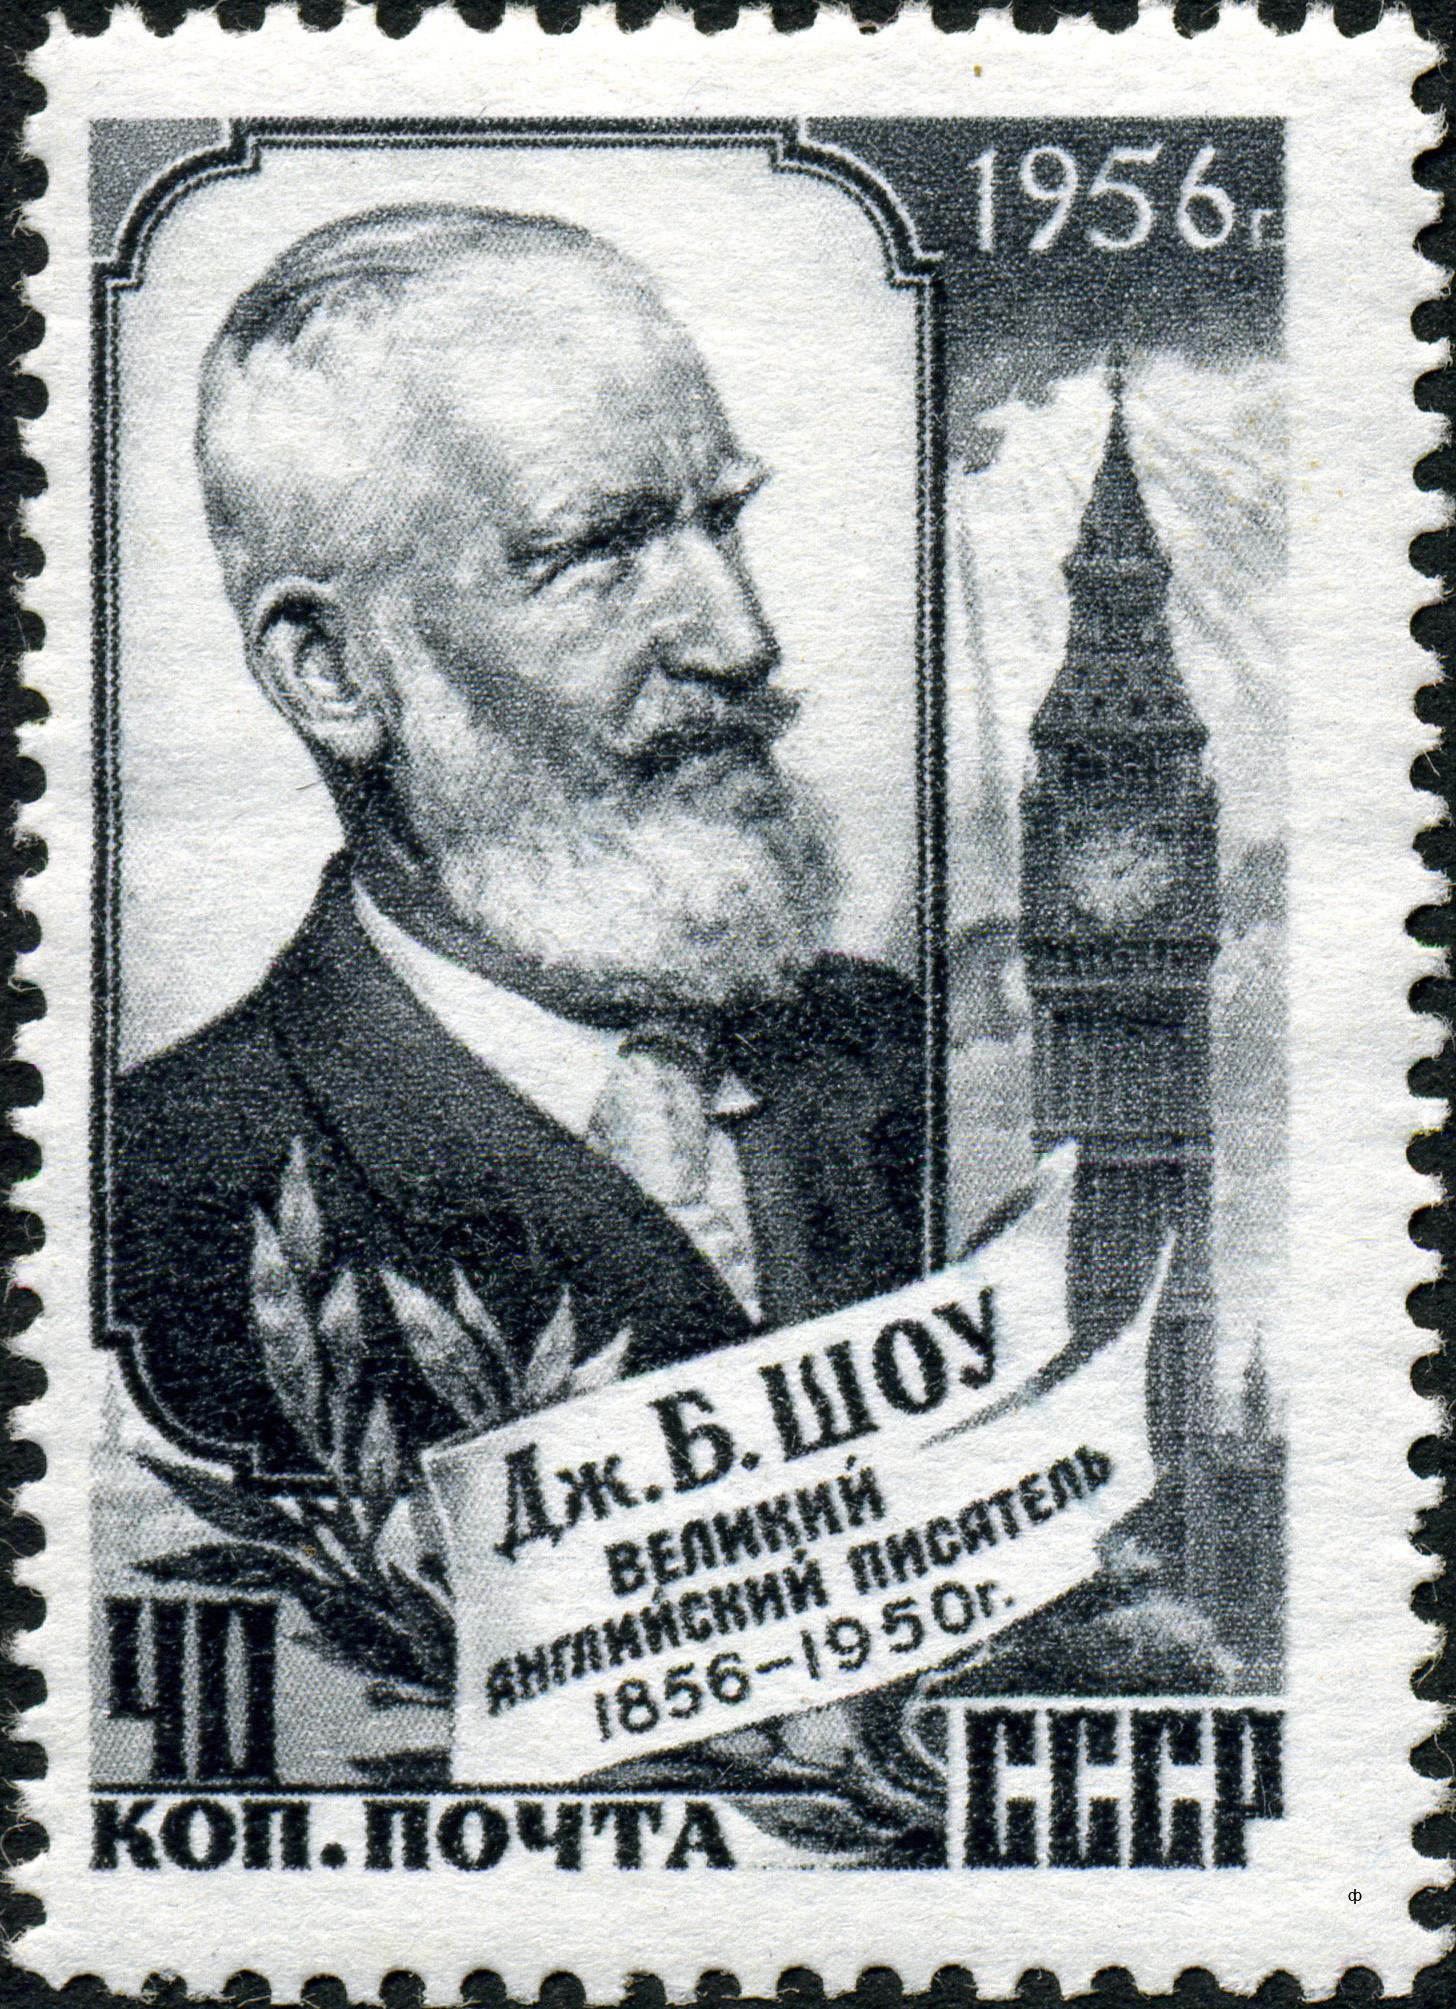 Джордж Бернард Шоу (англ. George Bernard Shaw). Почтовая марка СССР